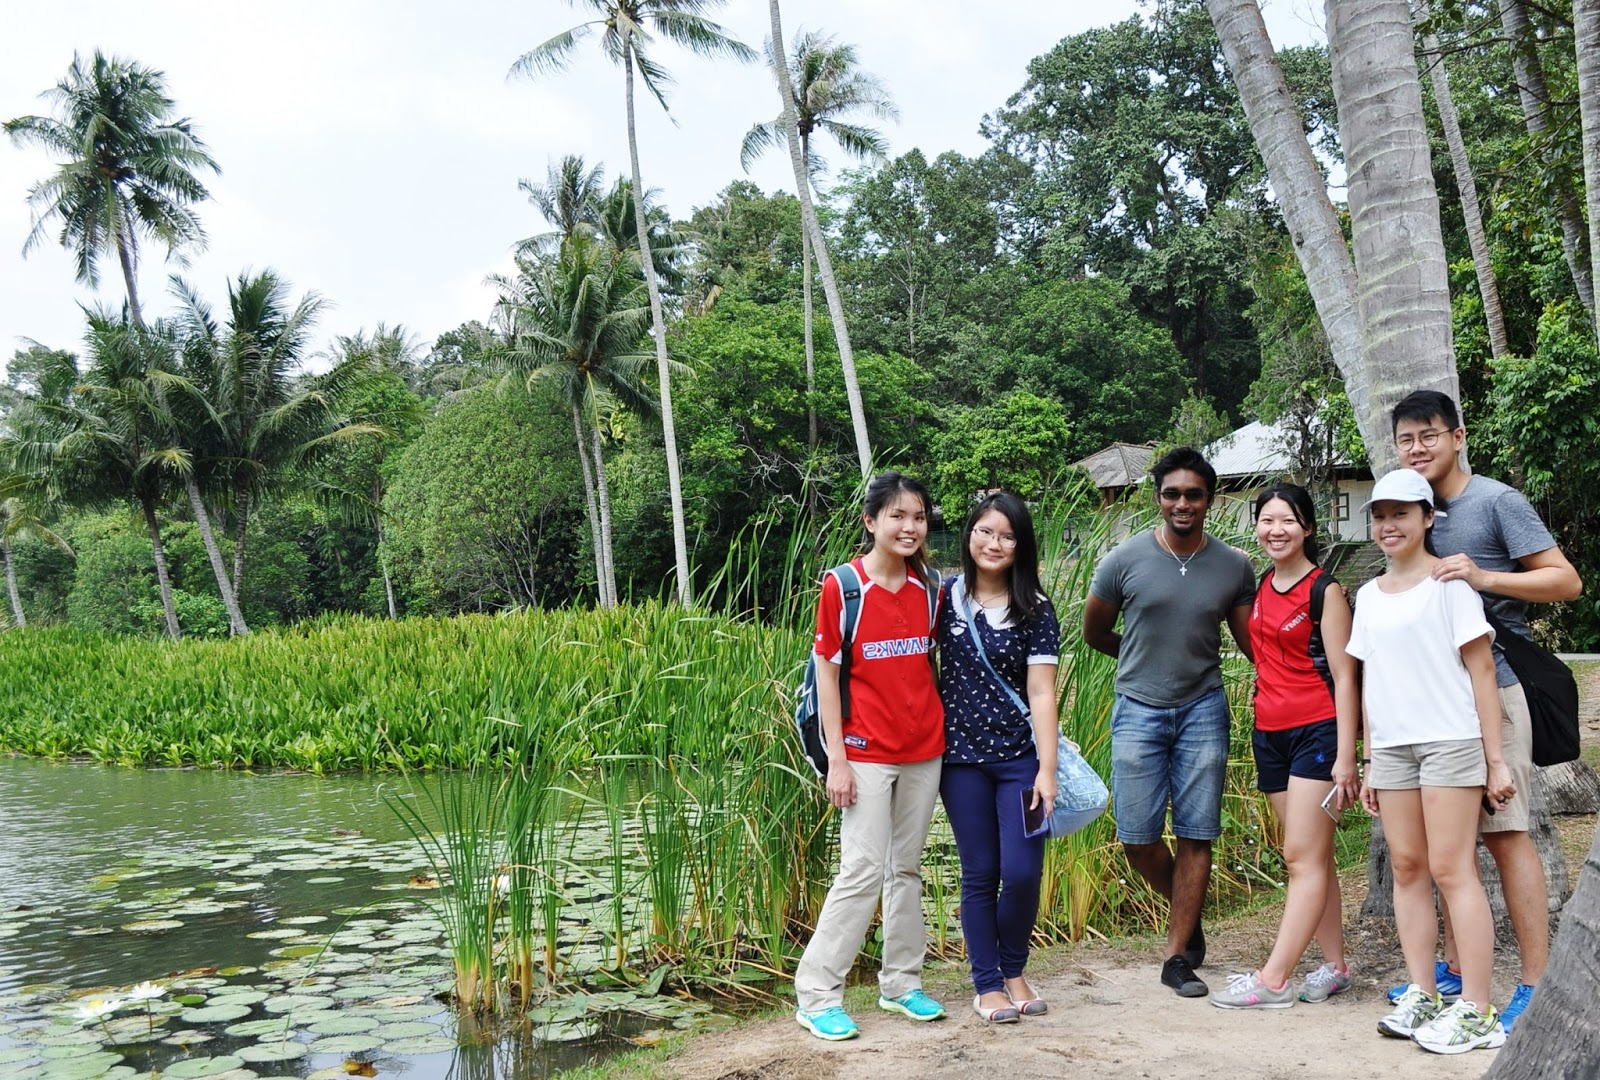 Love Gone Wild at Pulau Ubin!